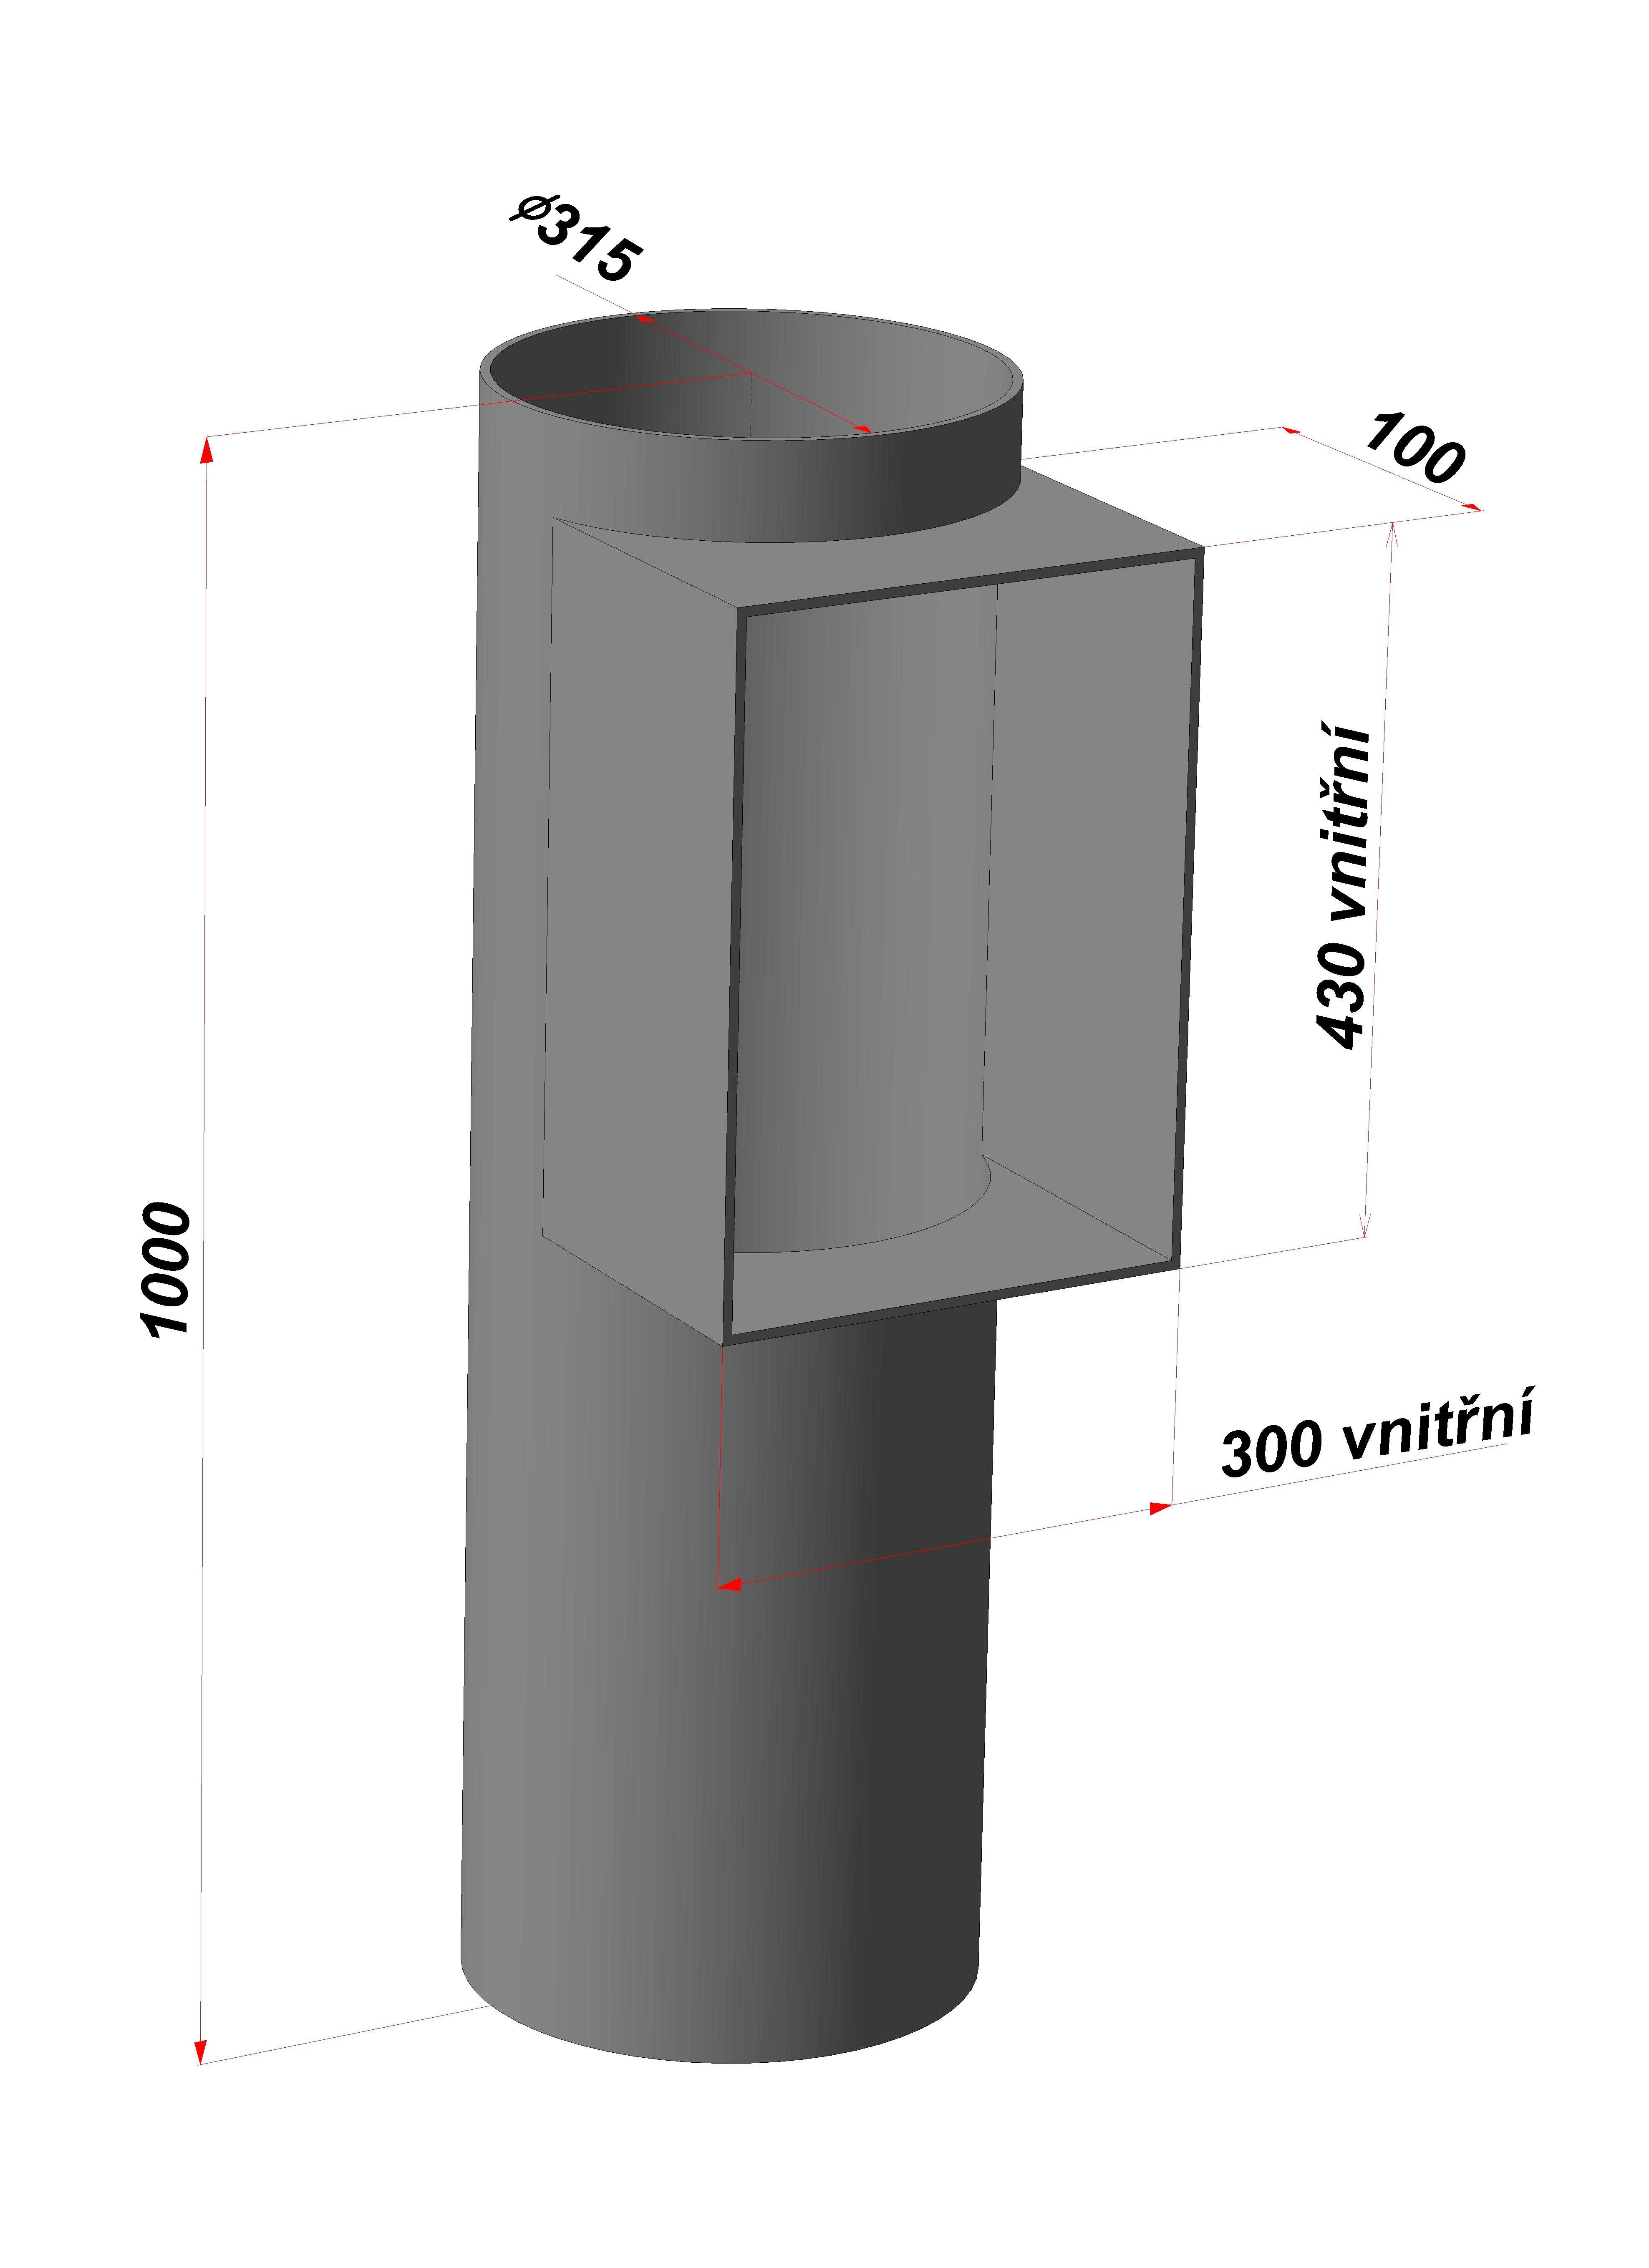 vhadzovaci-diel-na-zhod-1m-plast